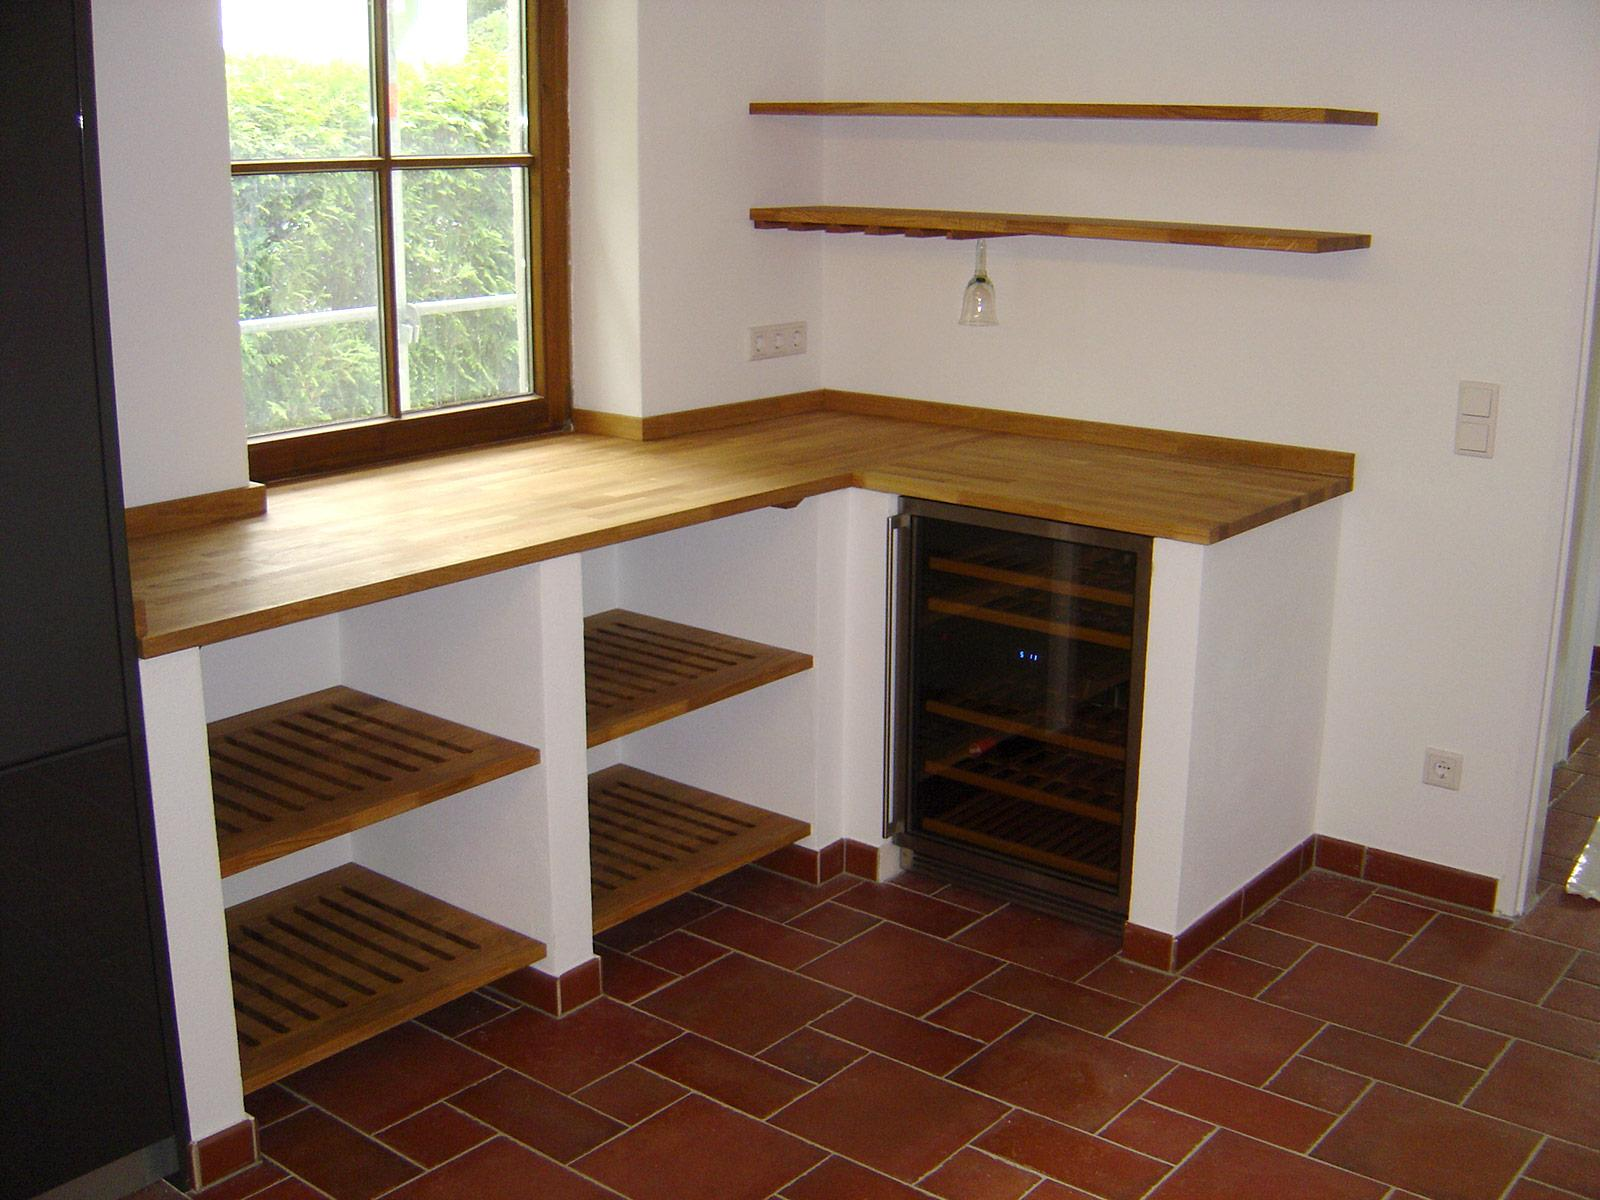 Küche Rustikal Selber Bauen